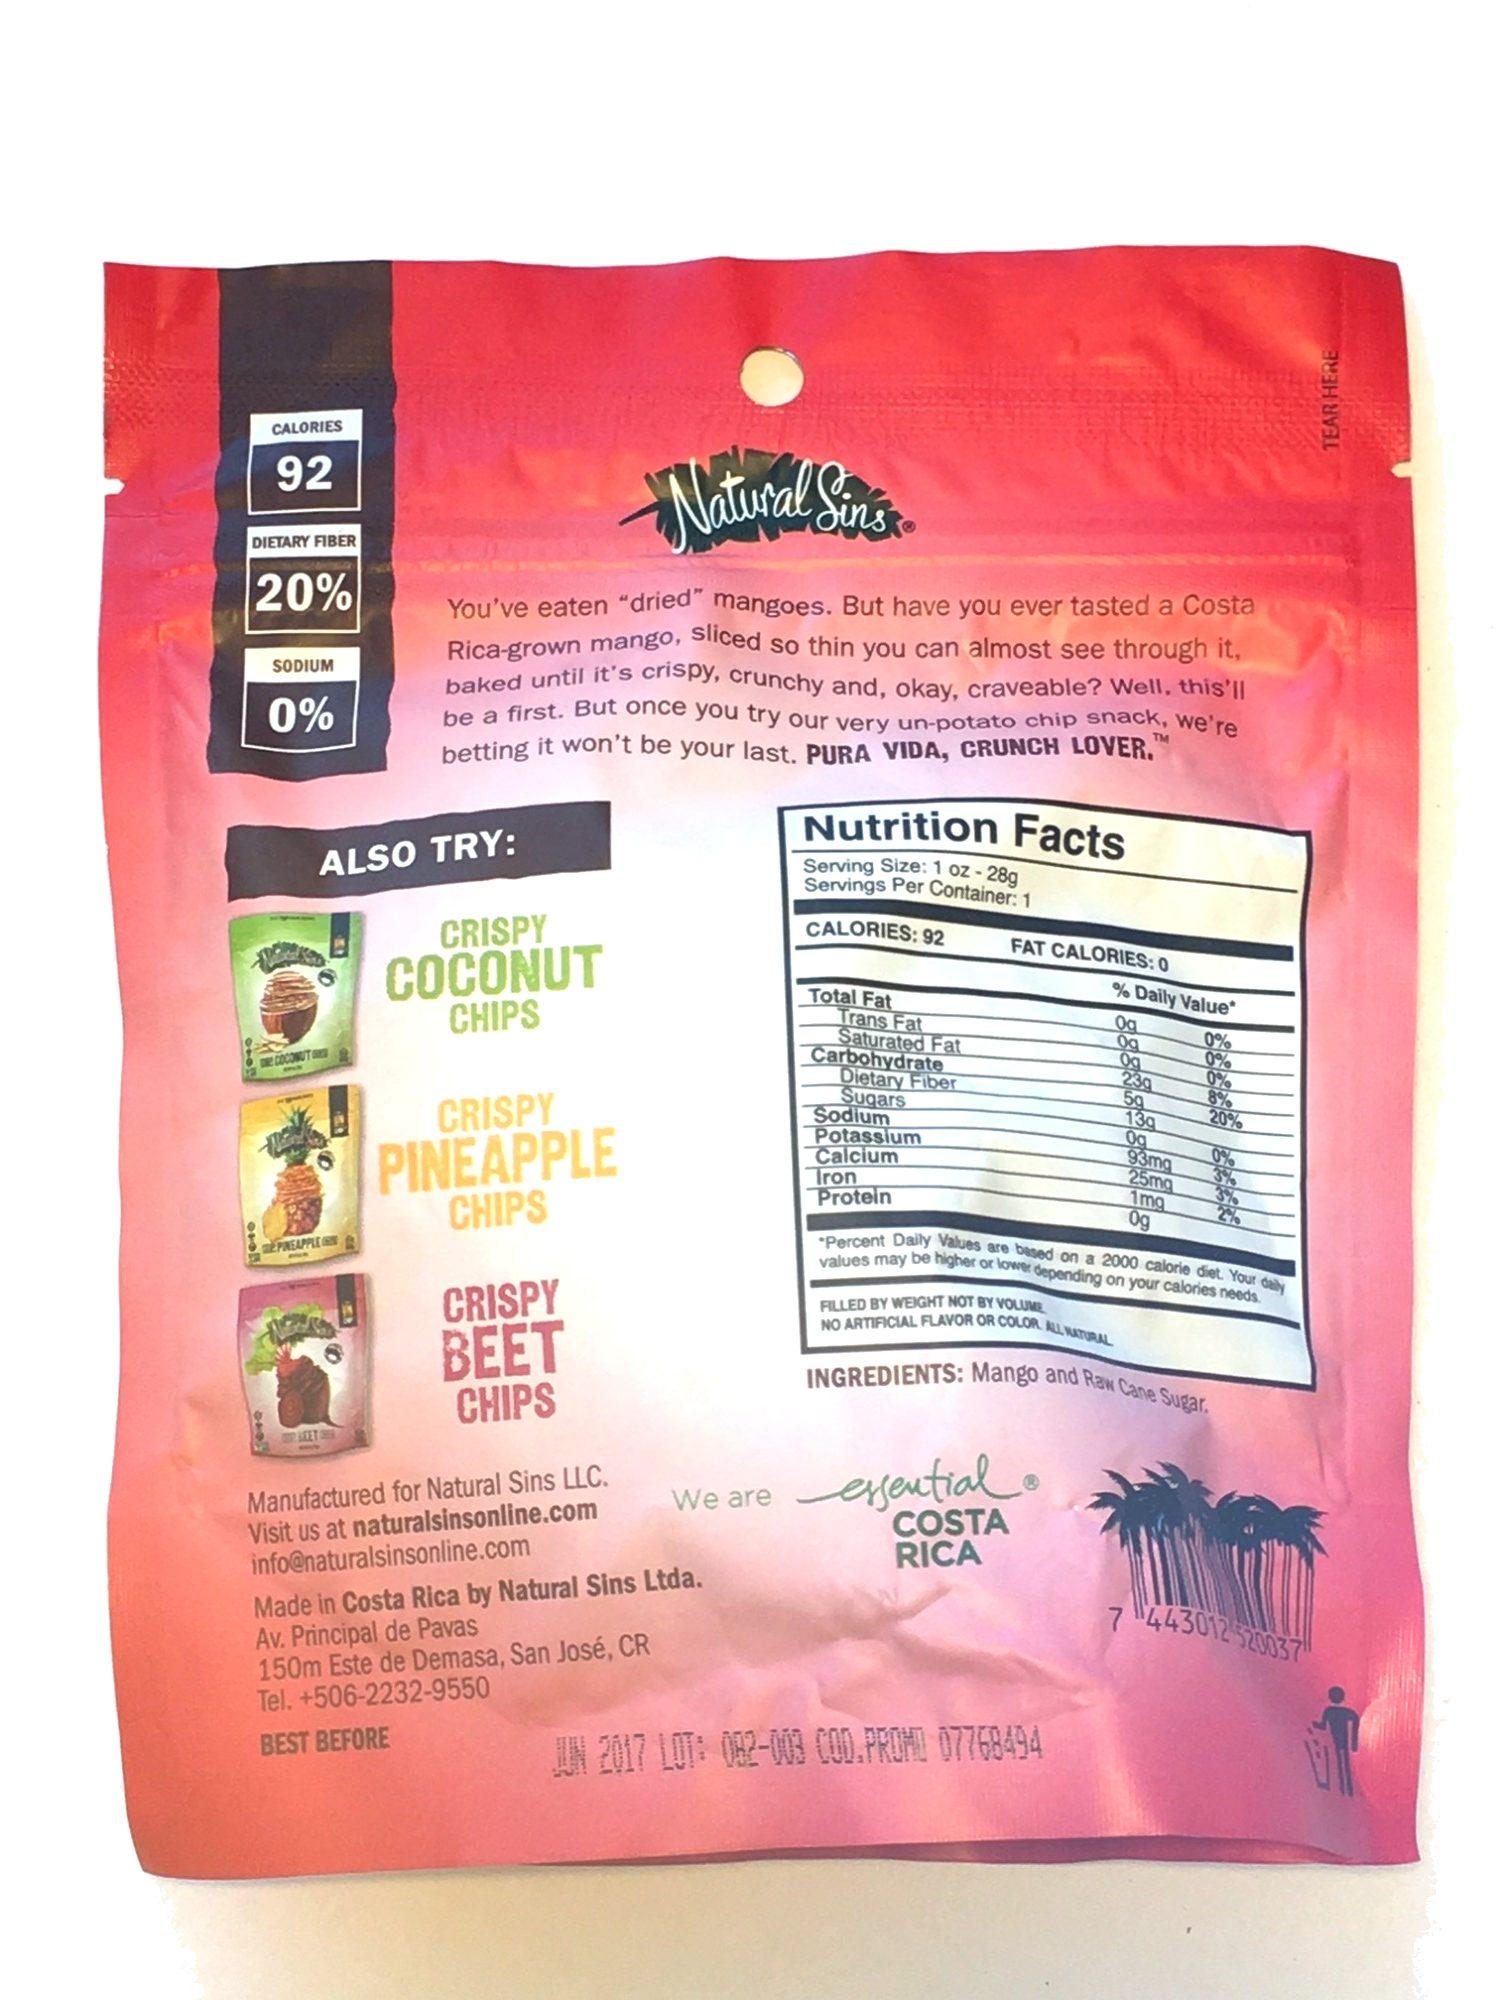 Crispy Mango Chips - Nutrition facts